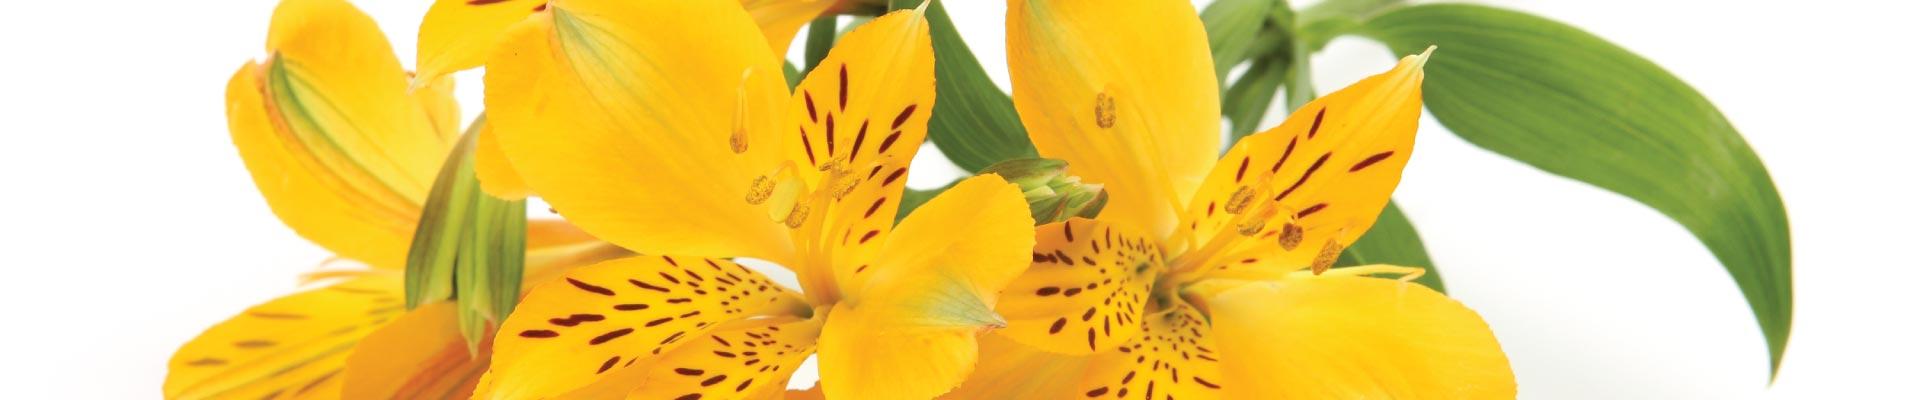 blossom-boutique-floral-banner-2